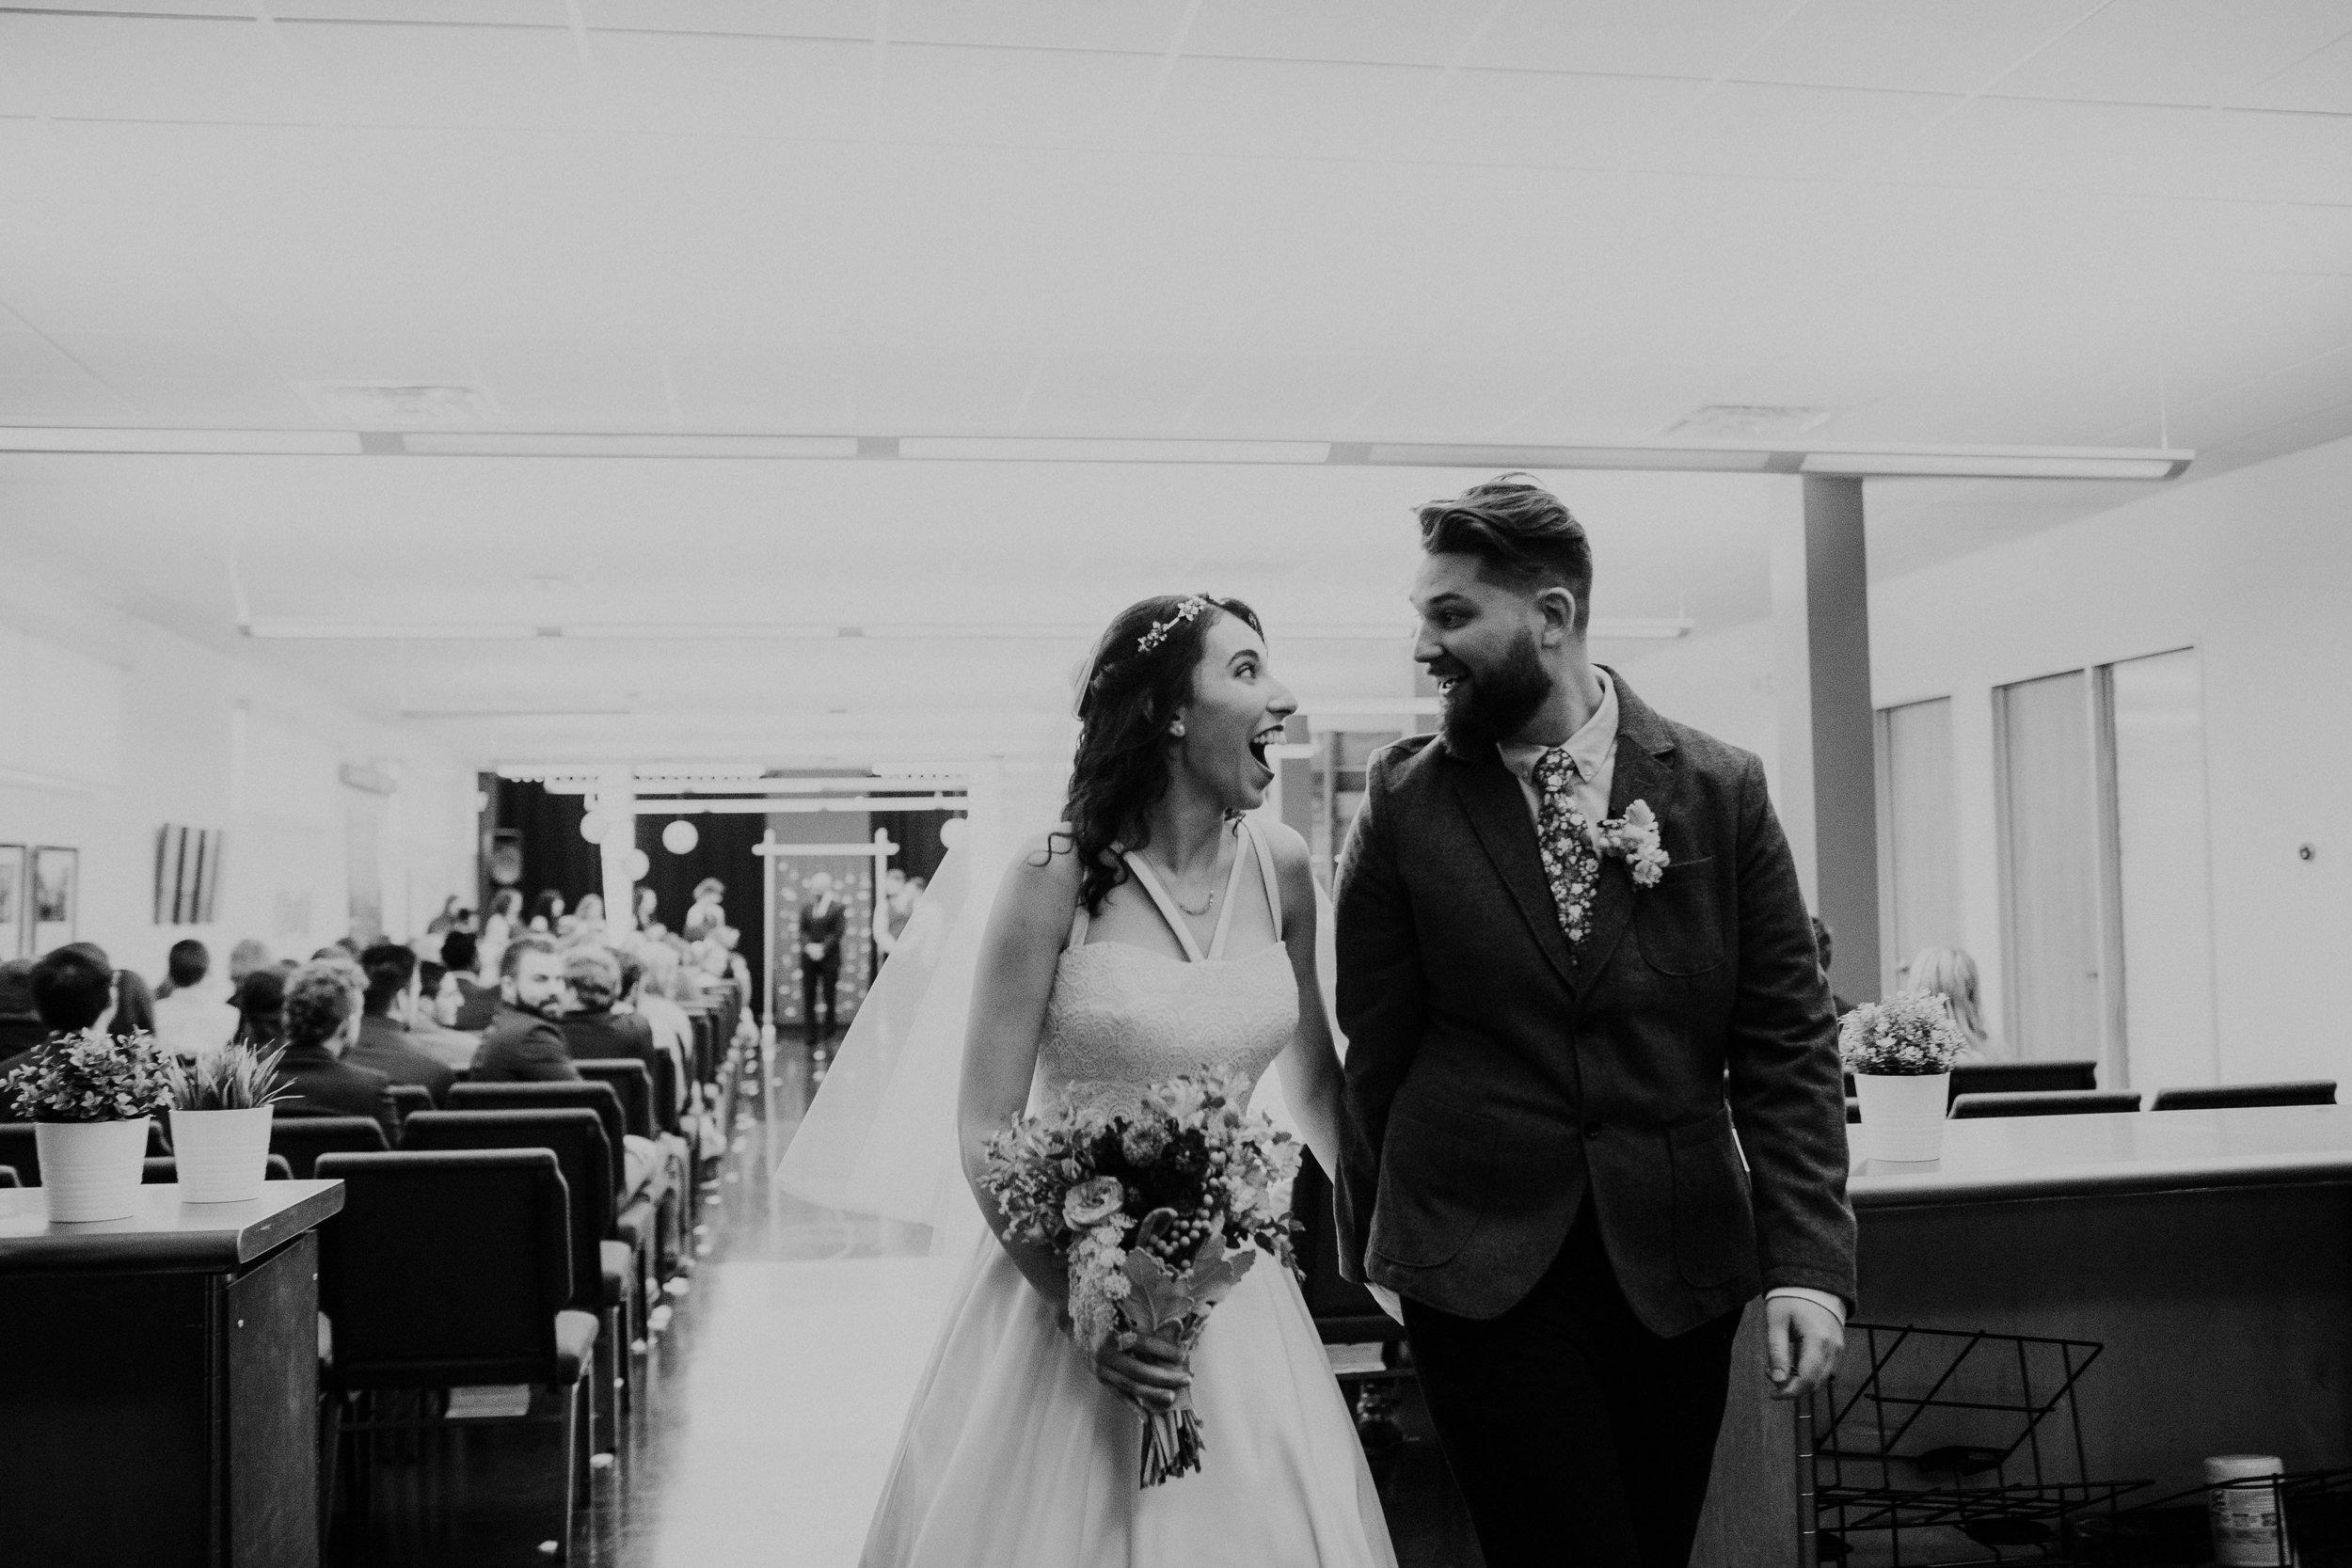 Columbus, Ohio Wedding Photographer Everal Barn At Heritage Park Wedding Venue Grace E Jones Photography56.jpg